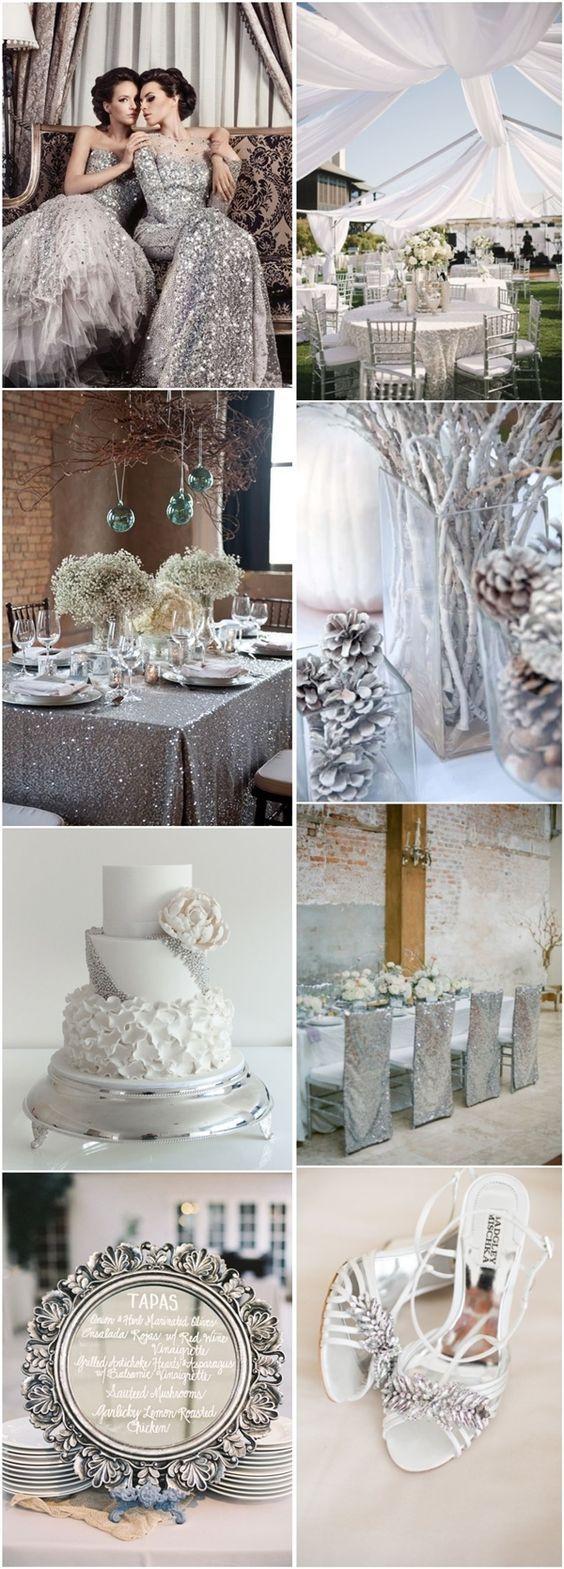 50 Silver Winter Wedding Ideas for Your Big Day   http://www.deerpearlflowers.com/50-silver-winter-wedding-ideas-for-your-big-day/